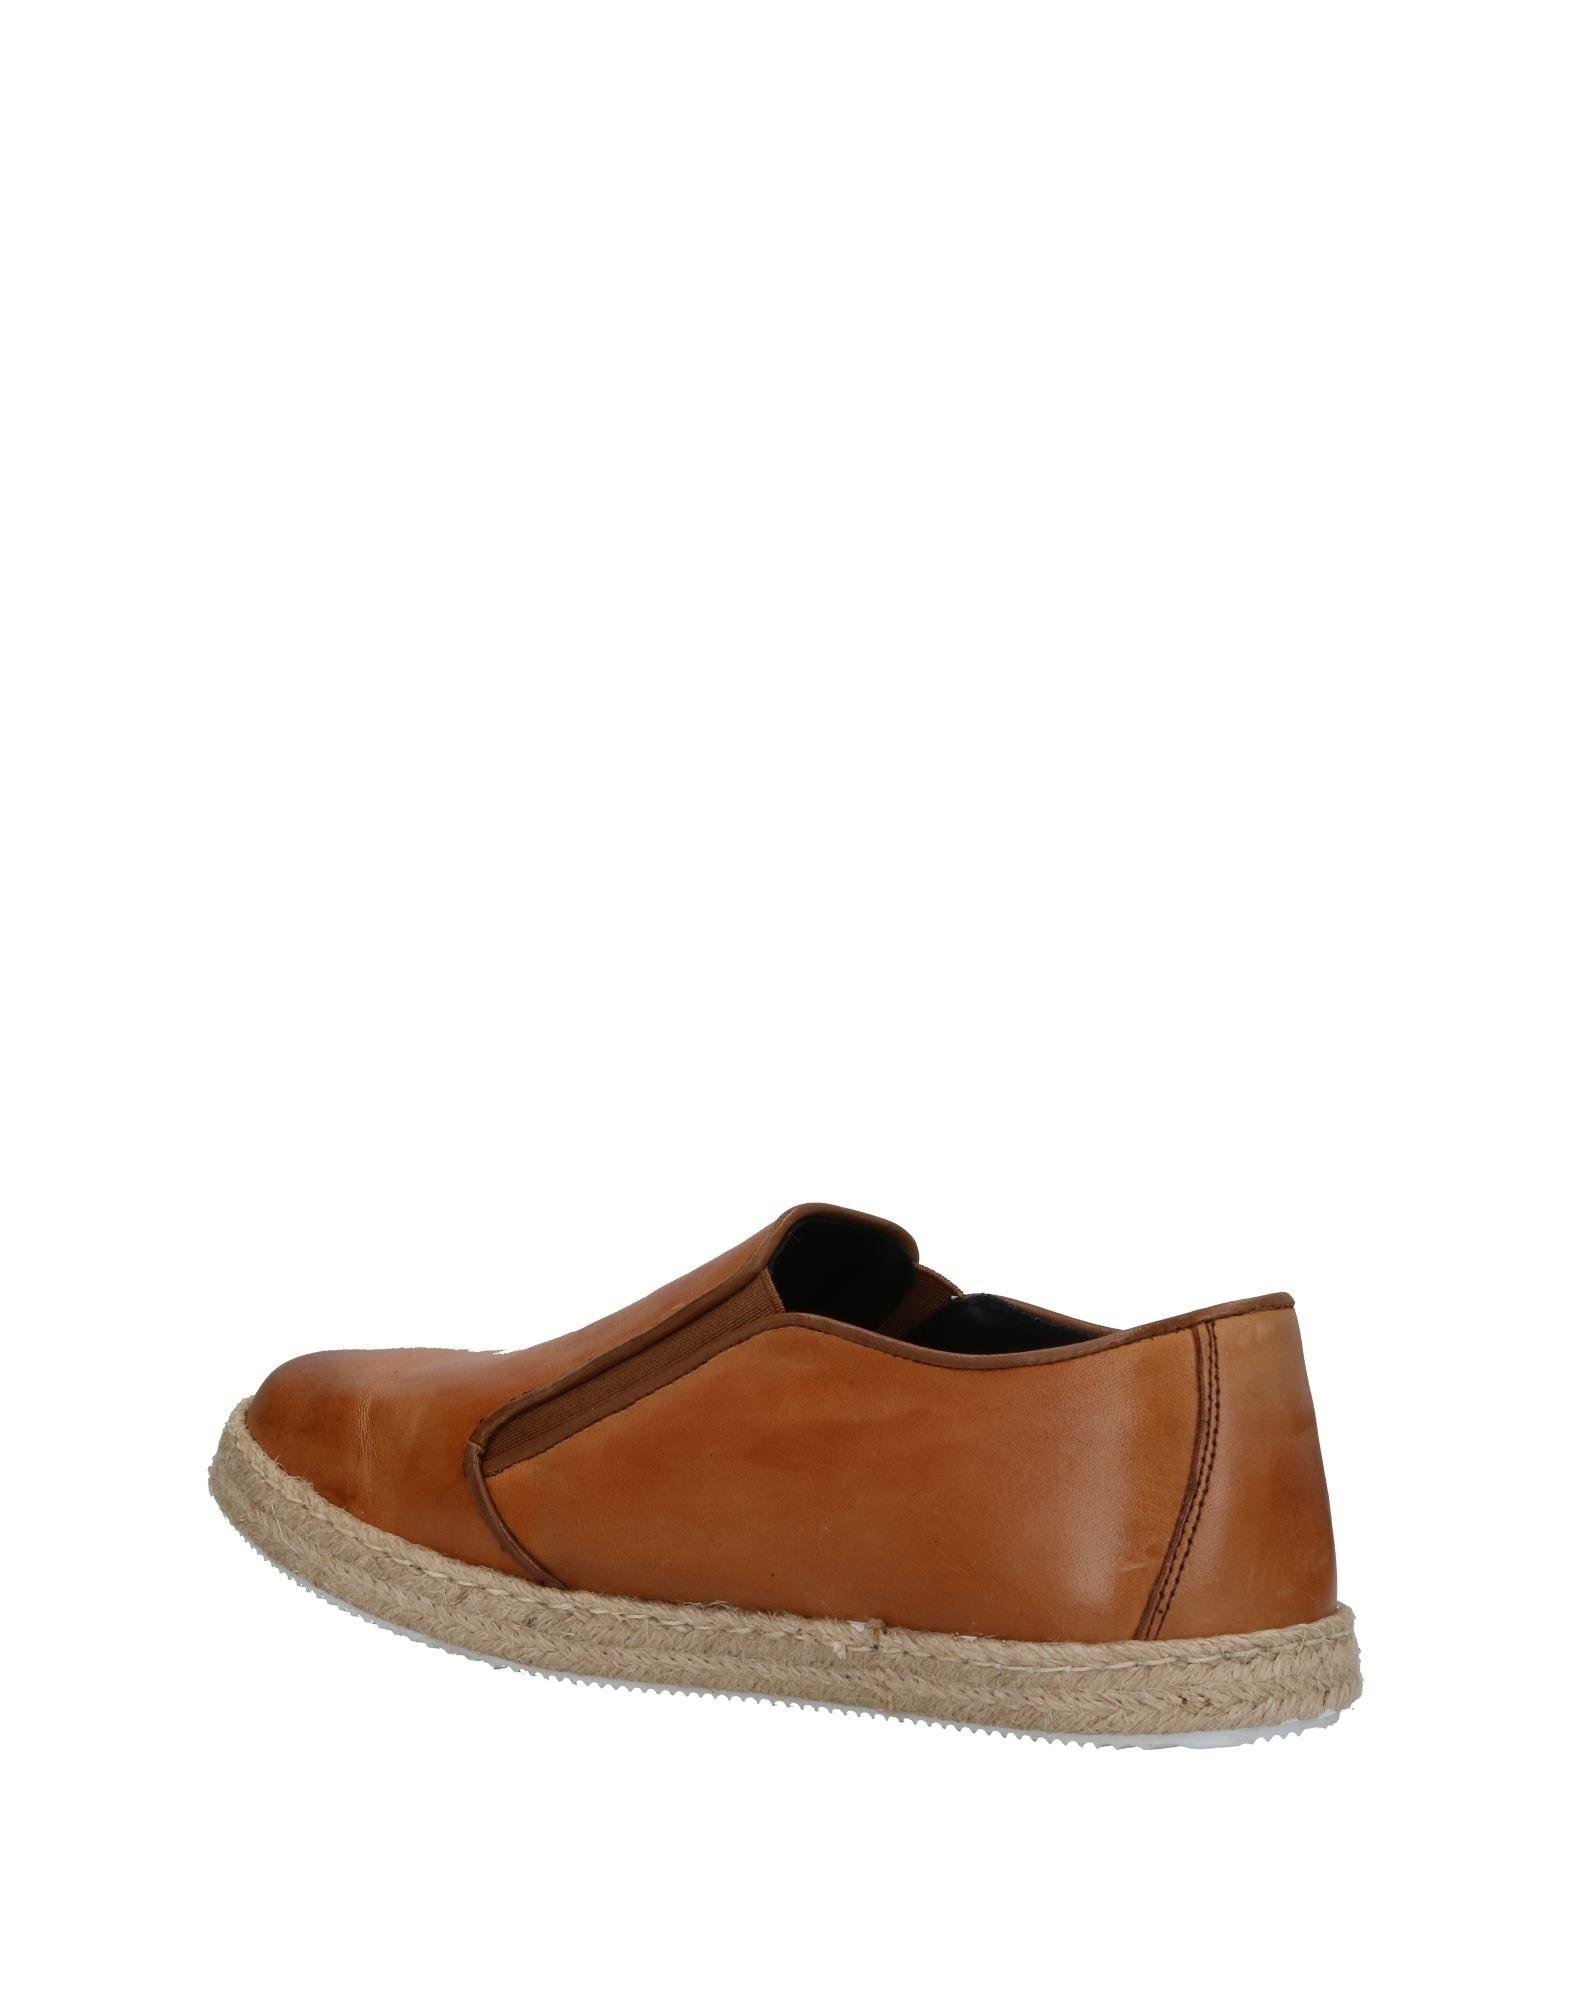 Sneakers Bottega Marchigiana Homme - Sneakers Bottega Marchigiana sur